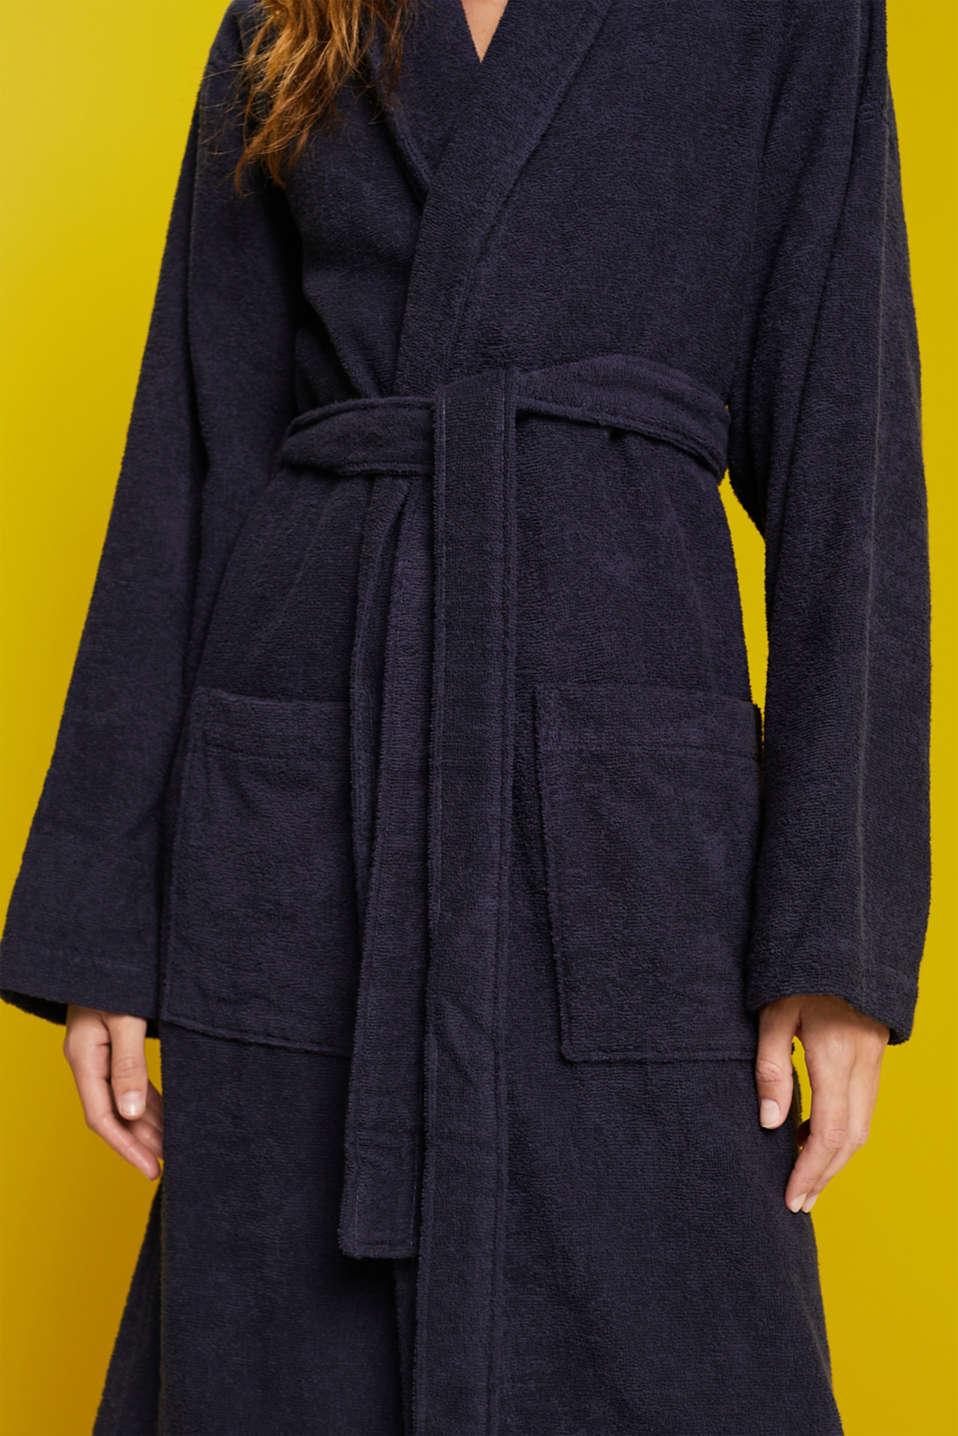 Unisex swimsuit, 100% cotton, NAVY BLUE, detail image number 3